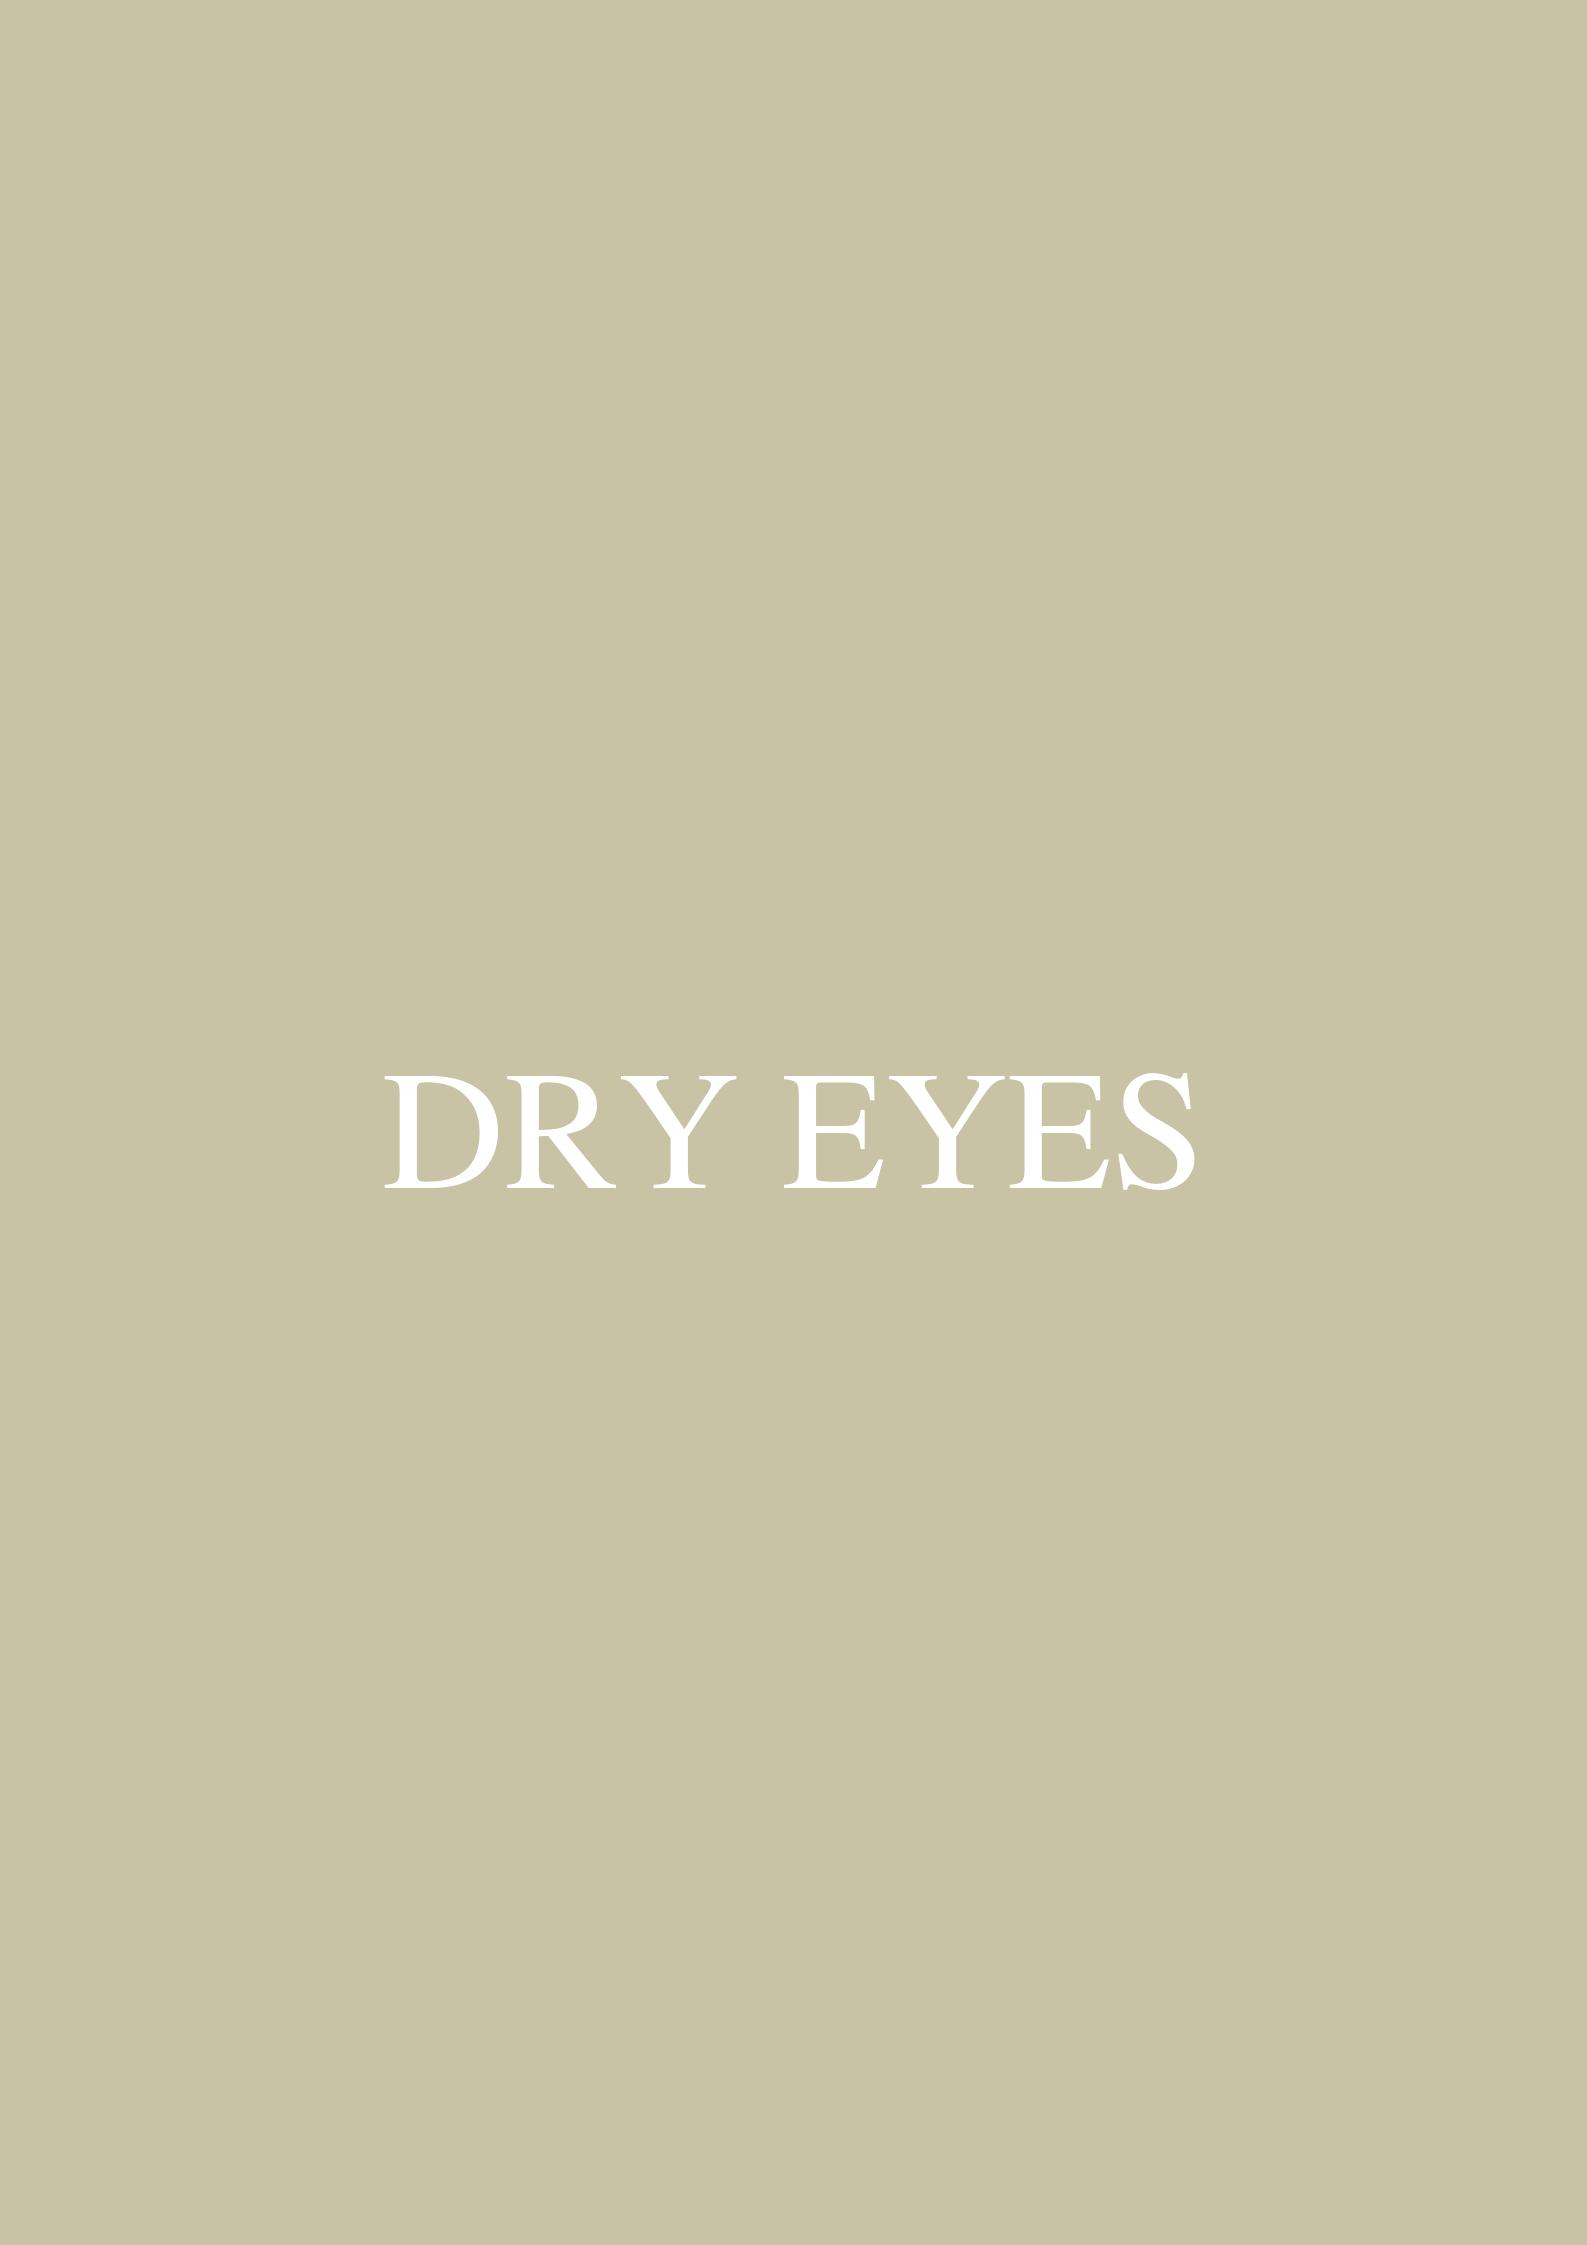 dry eyes.png